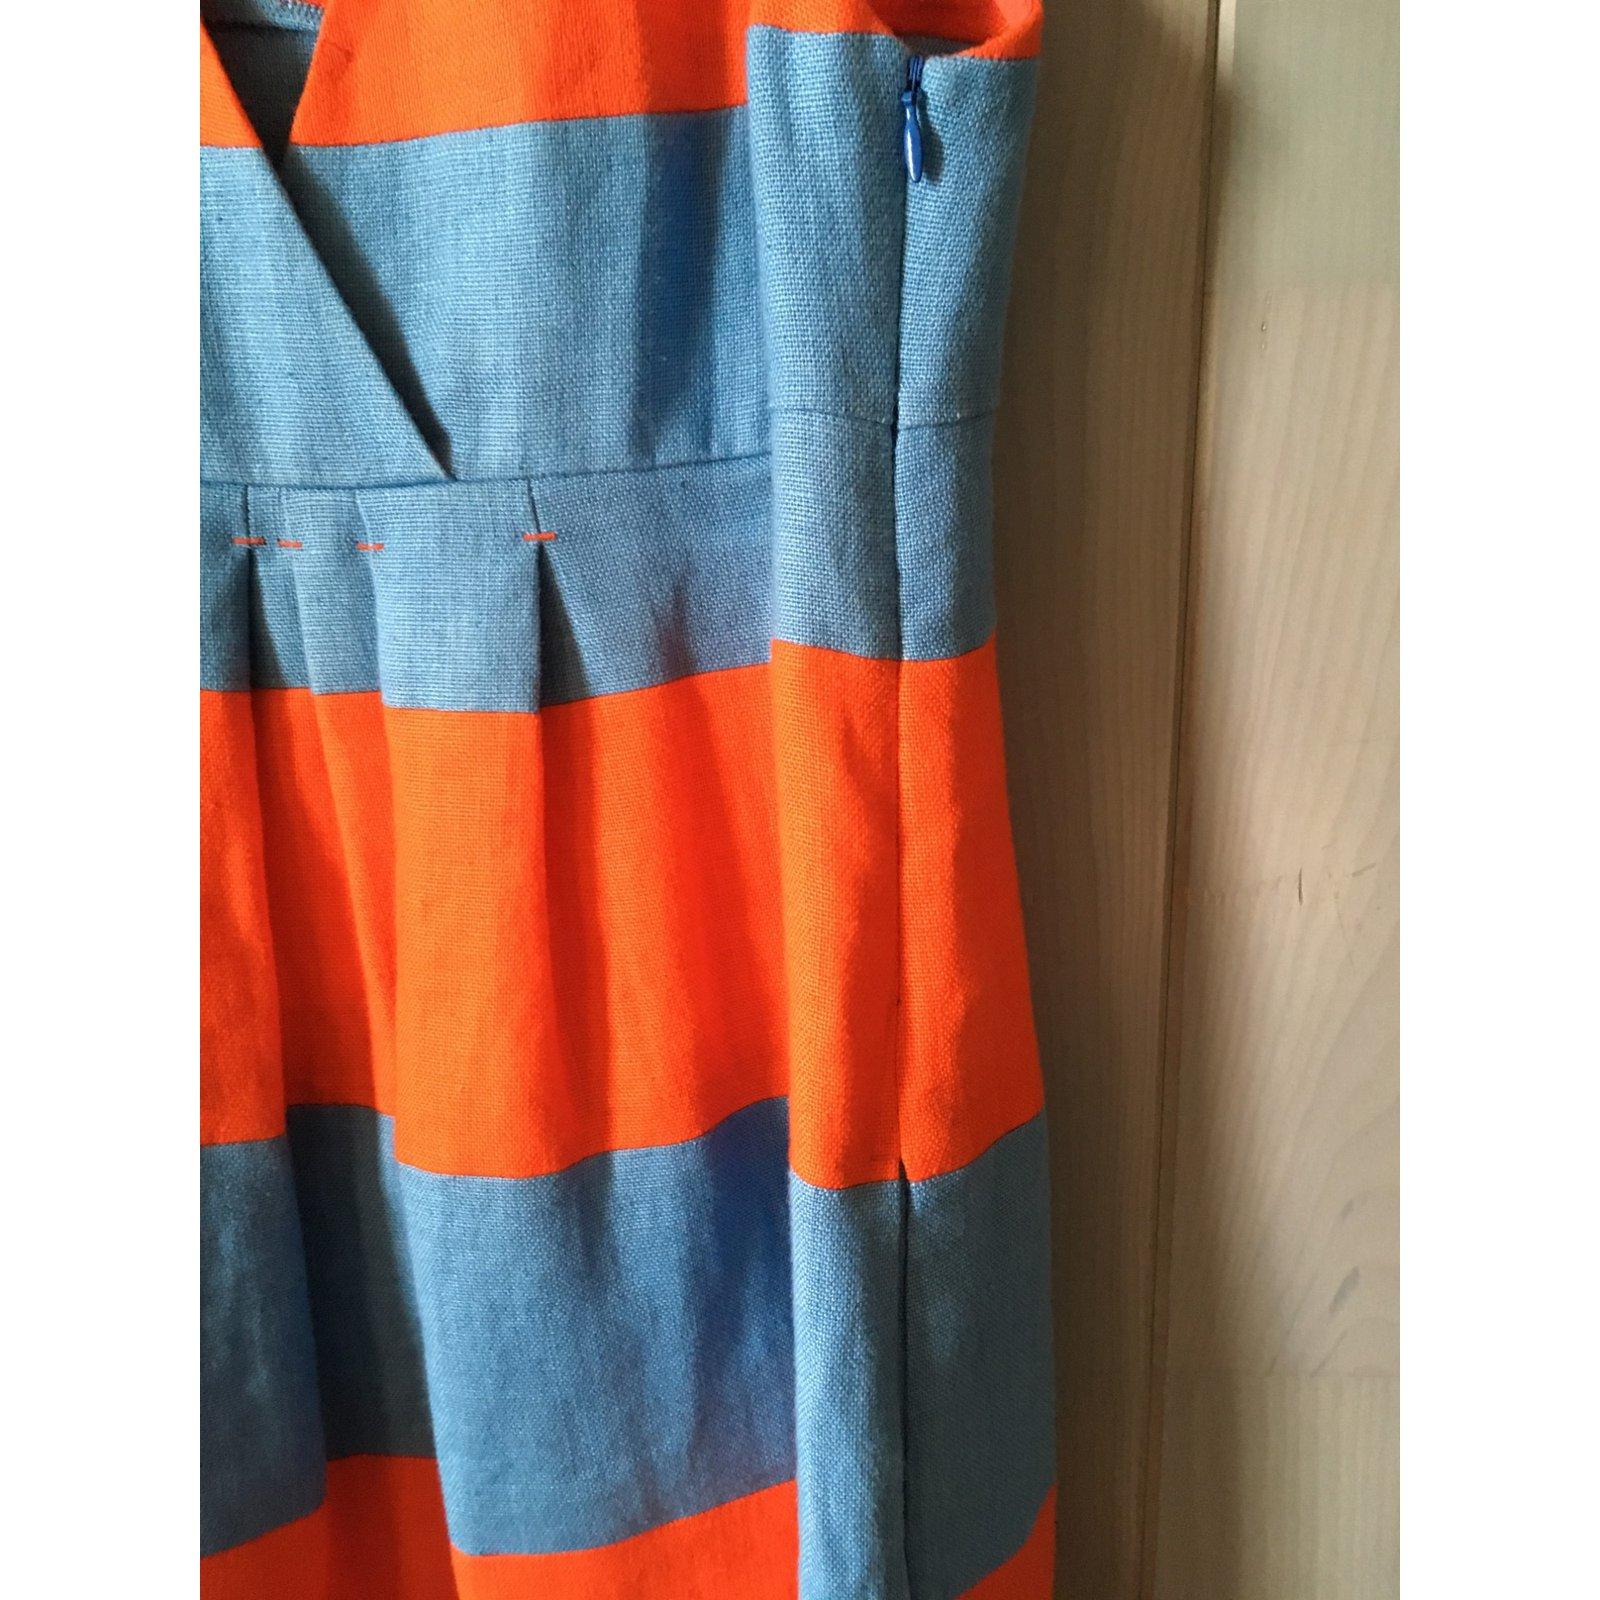 a21e36cd208 Sonia By Sonia Rykiel Sonia Rykiel orange and blue striped linen dress  Dresses Linen Blue